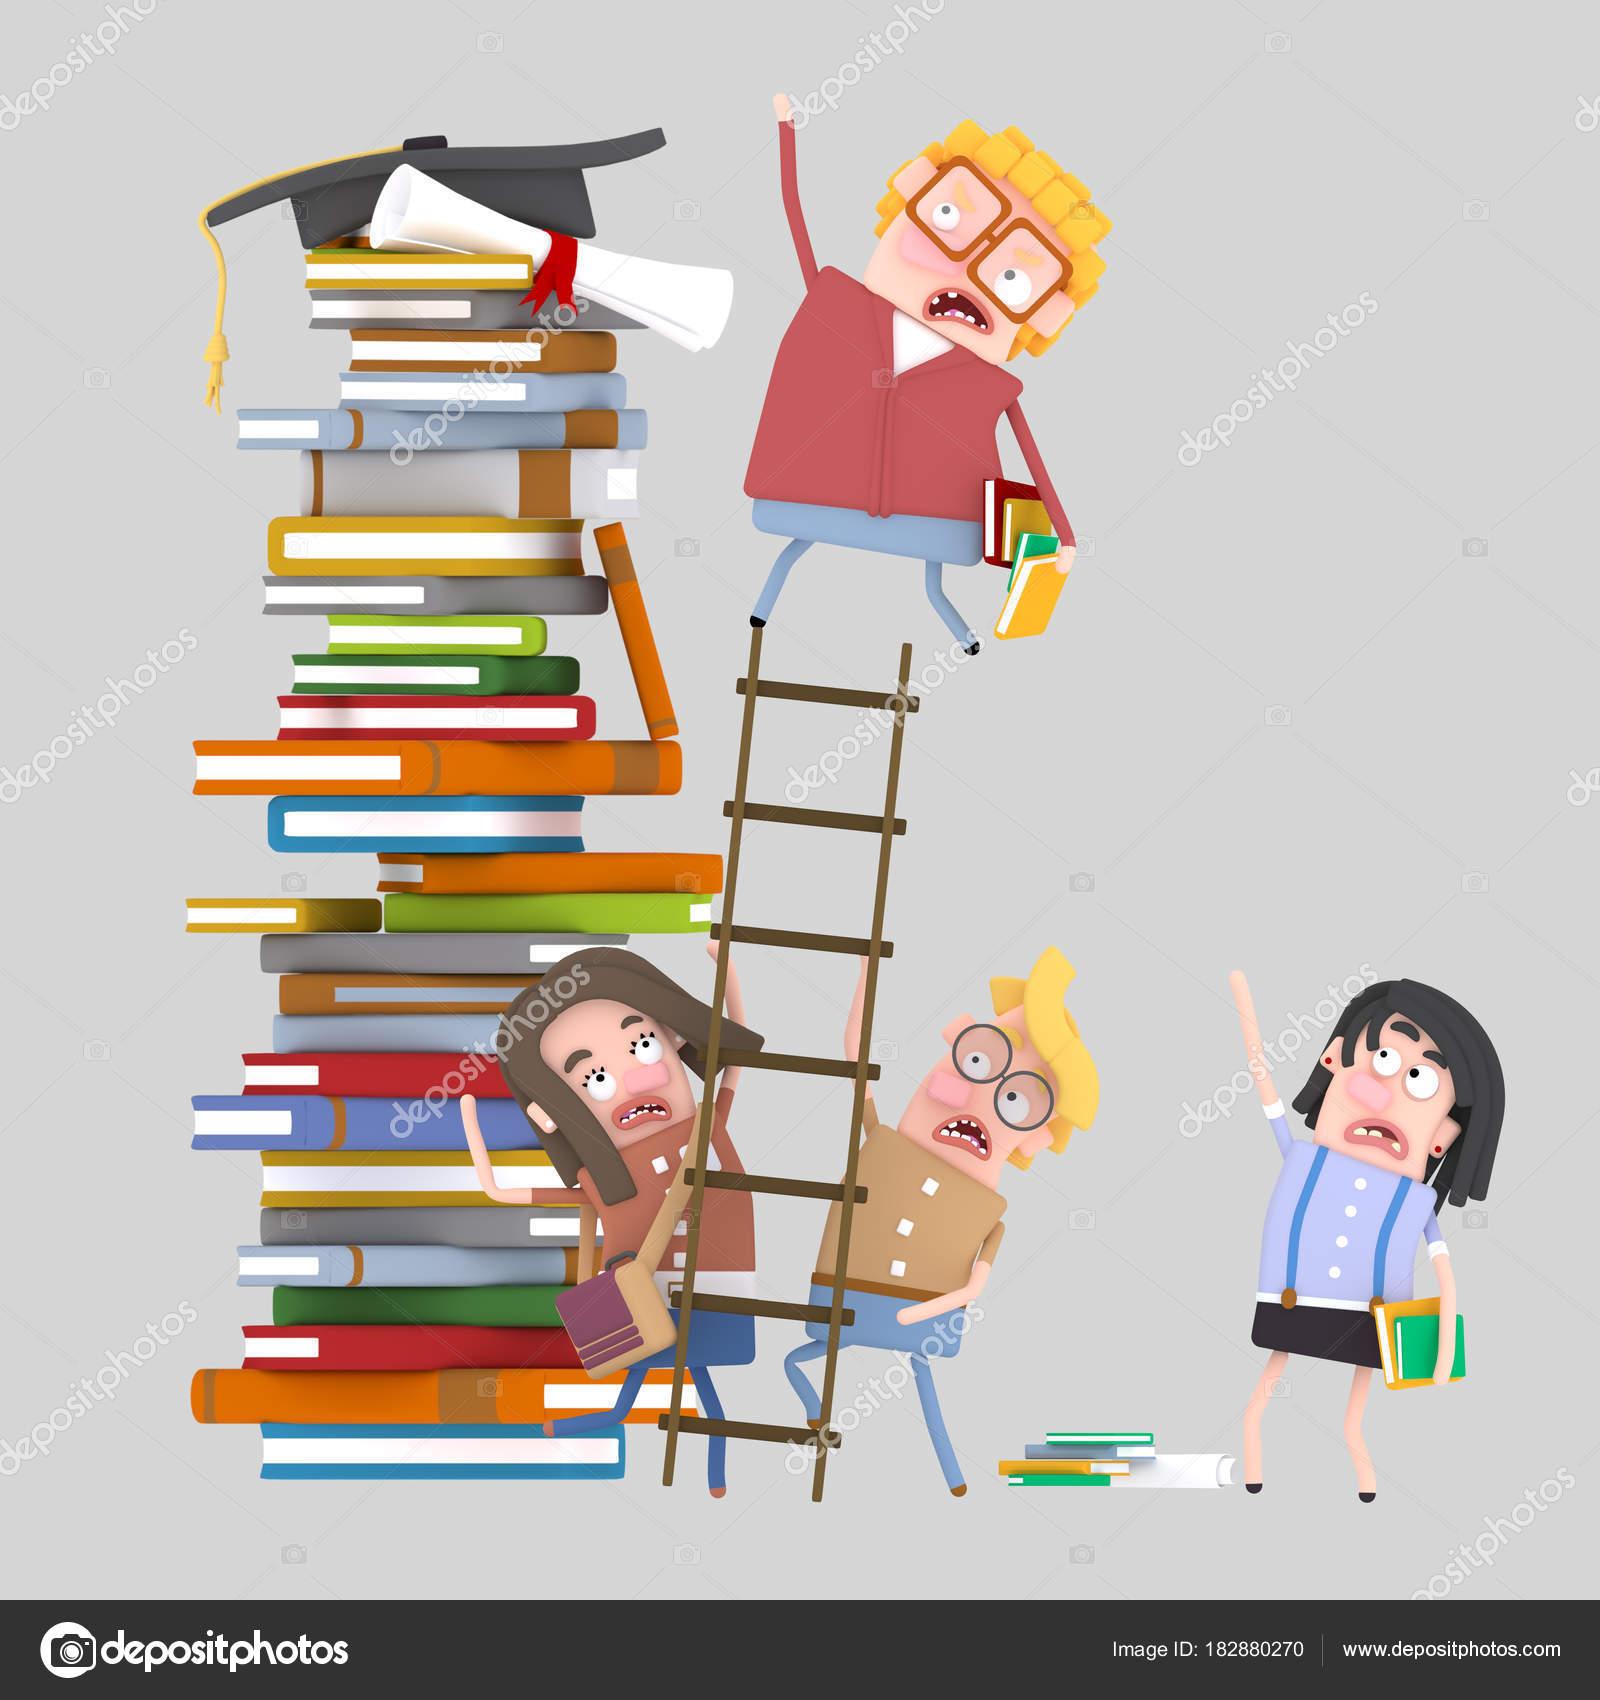 Student Climbing Ladder Illustration — Stock Photo © rasinmotion ... for Student Climbing Ladder  599kxo